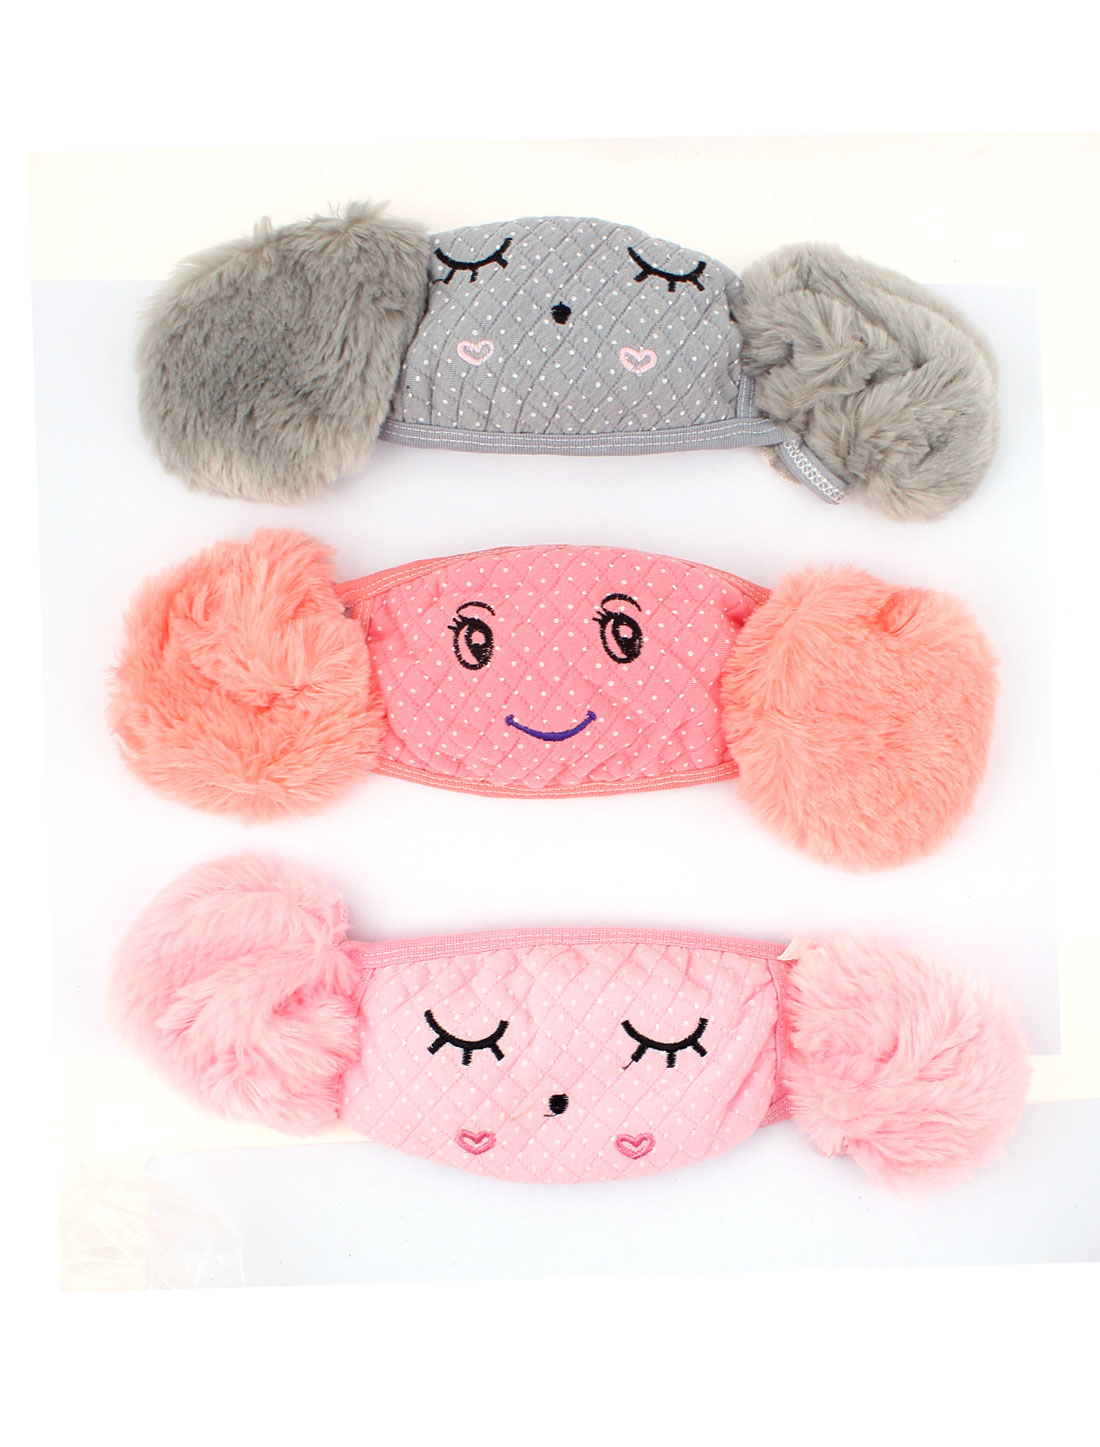 3Pcs Plush Earmuffs Eyebrow Print Dotted Anti-dust Earloop Face Mask